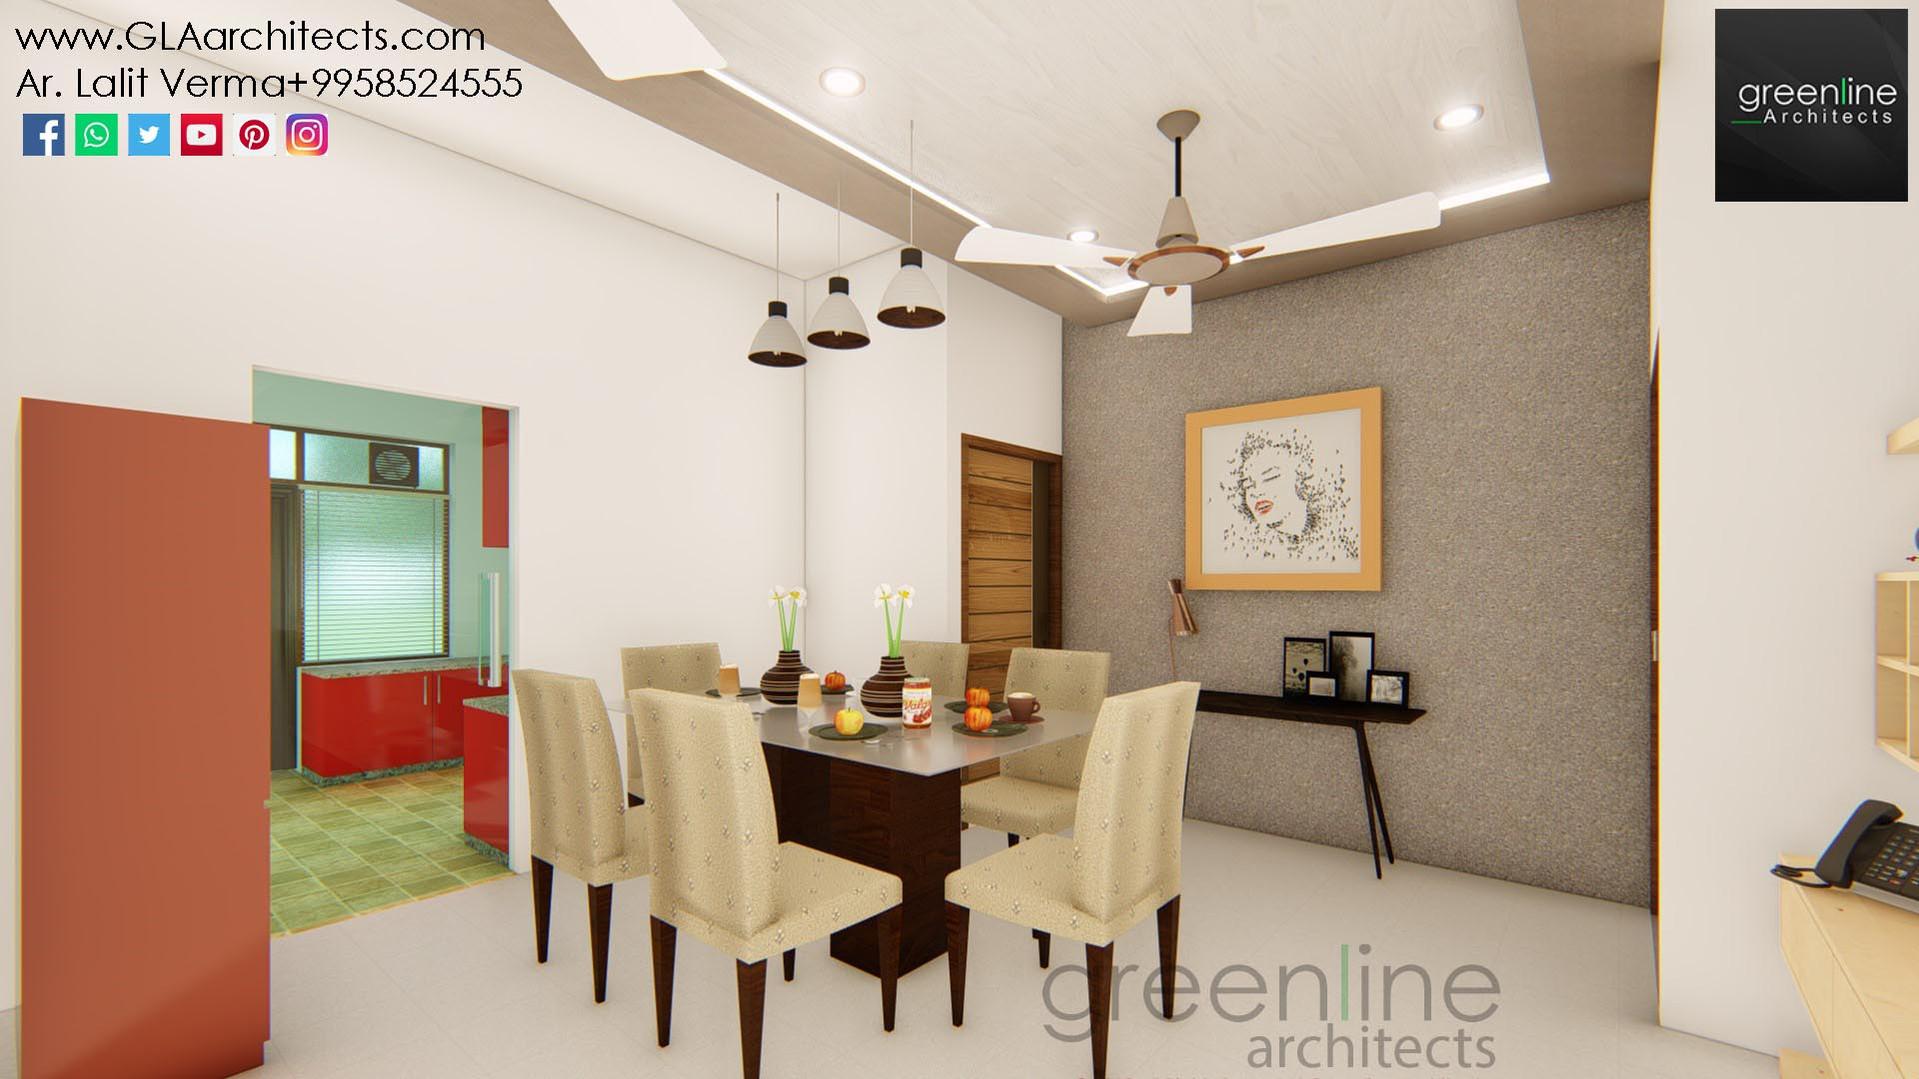 3 BHK-Apartment_Home Interior (7).jpg